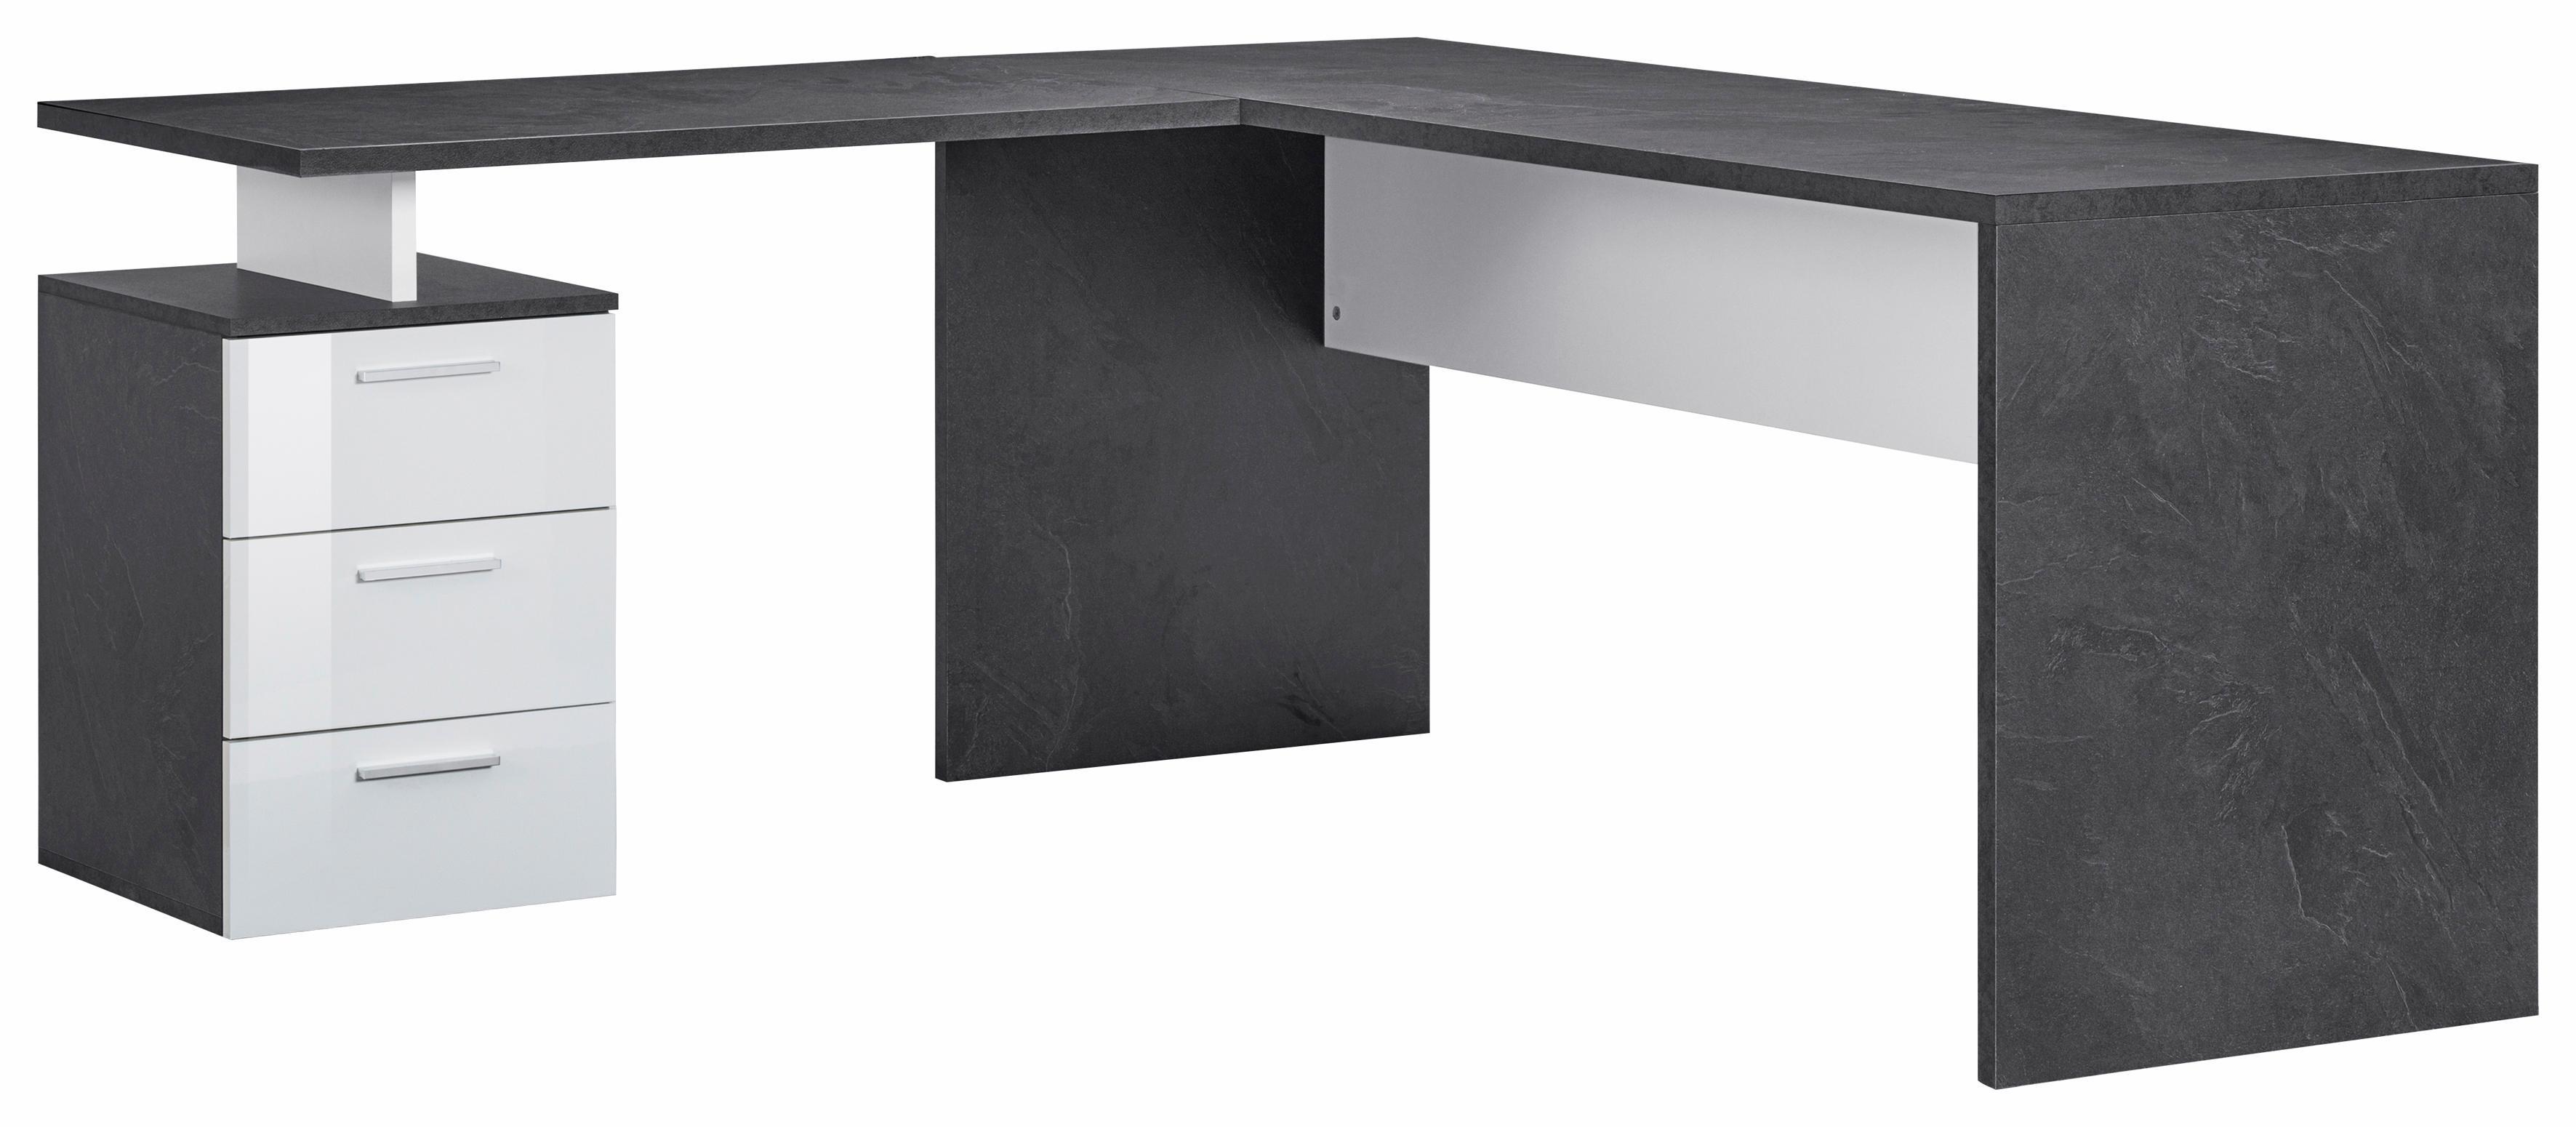 hoekbureau new selina bestel nu bij otto. Black Bedroom Furniture Sets. Home Design Ideas